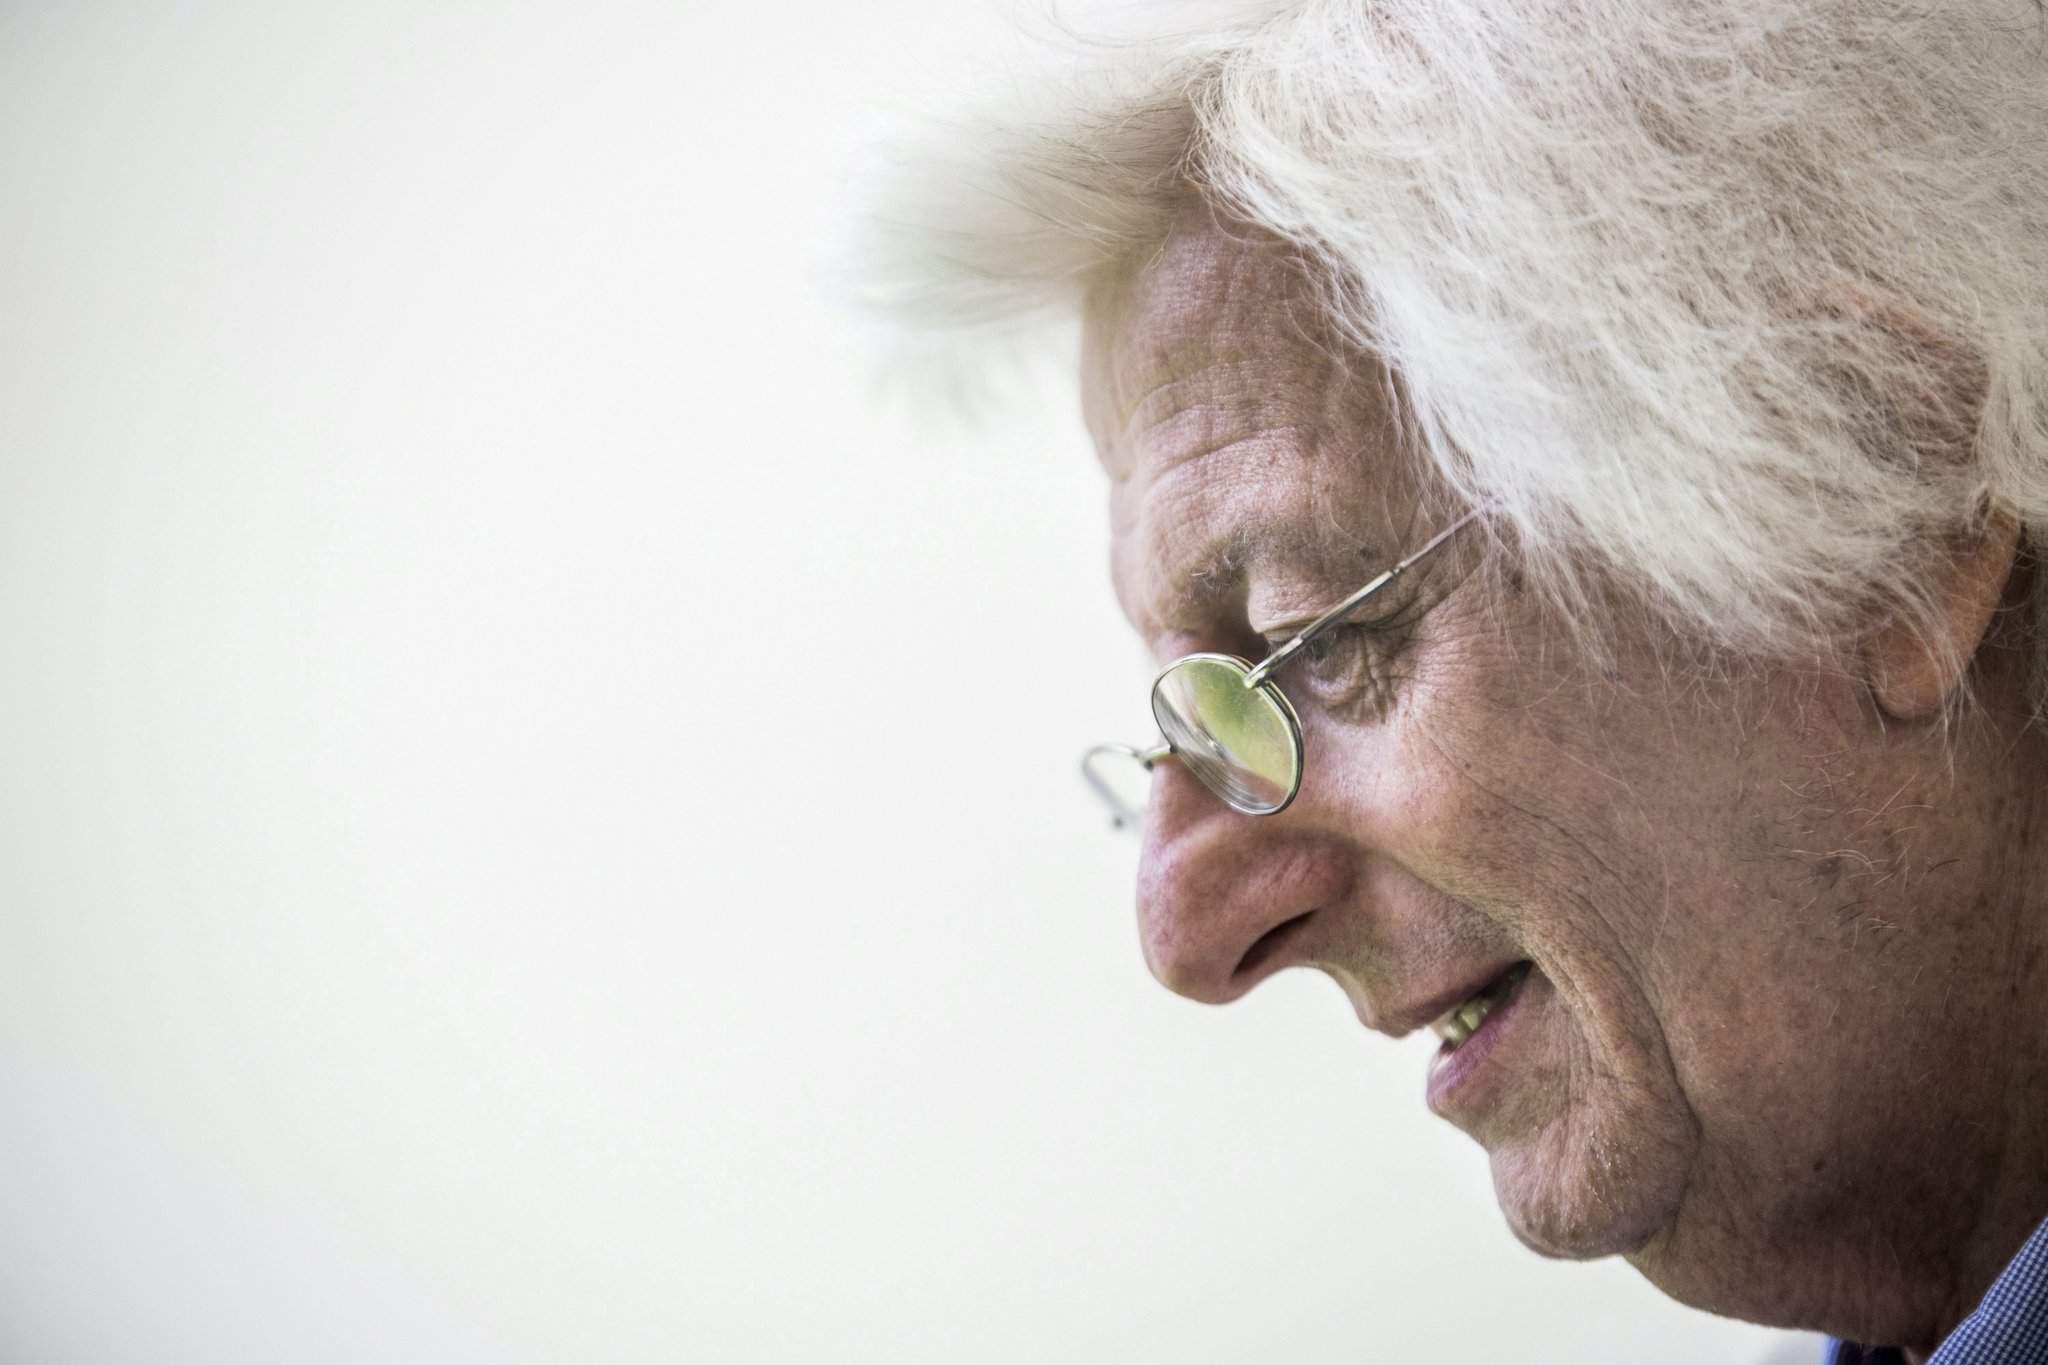 Hungarian author Péter Esterházy dies aged 66 – UPDATE